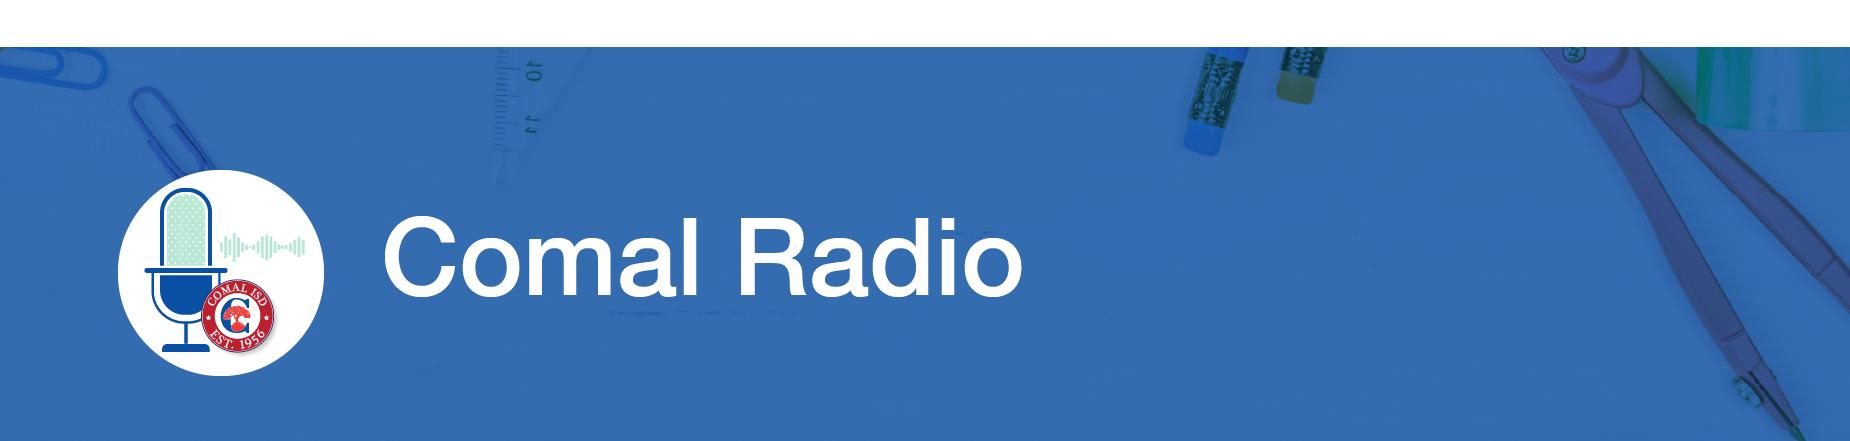 Comal Radio Banner